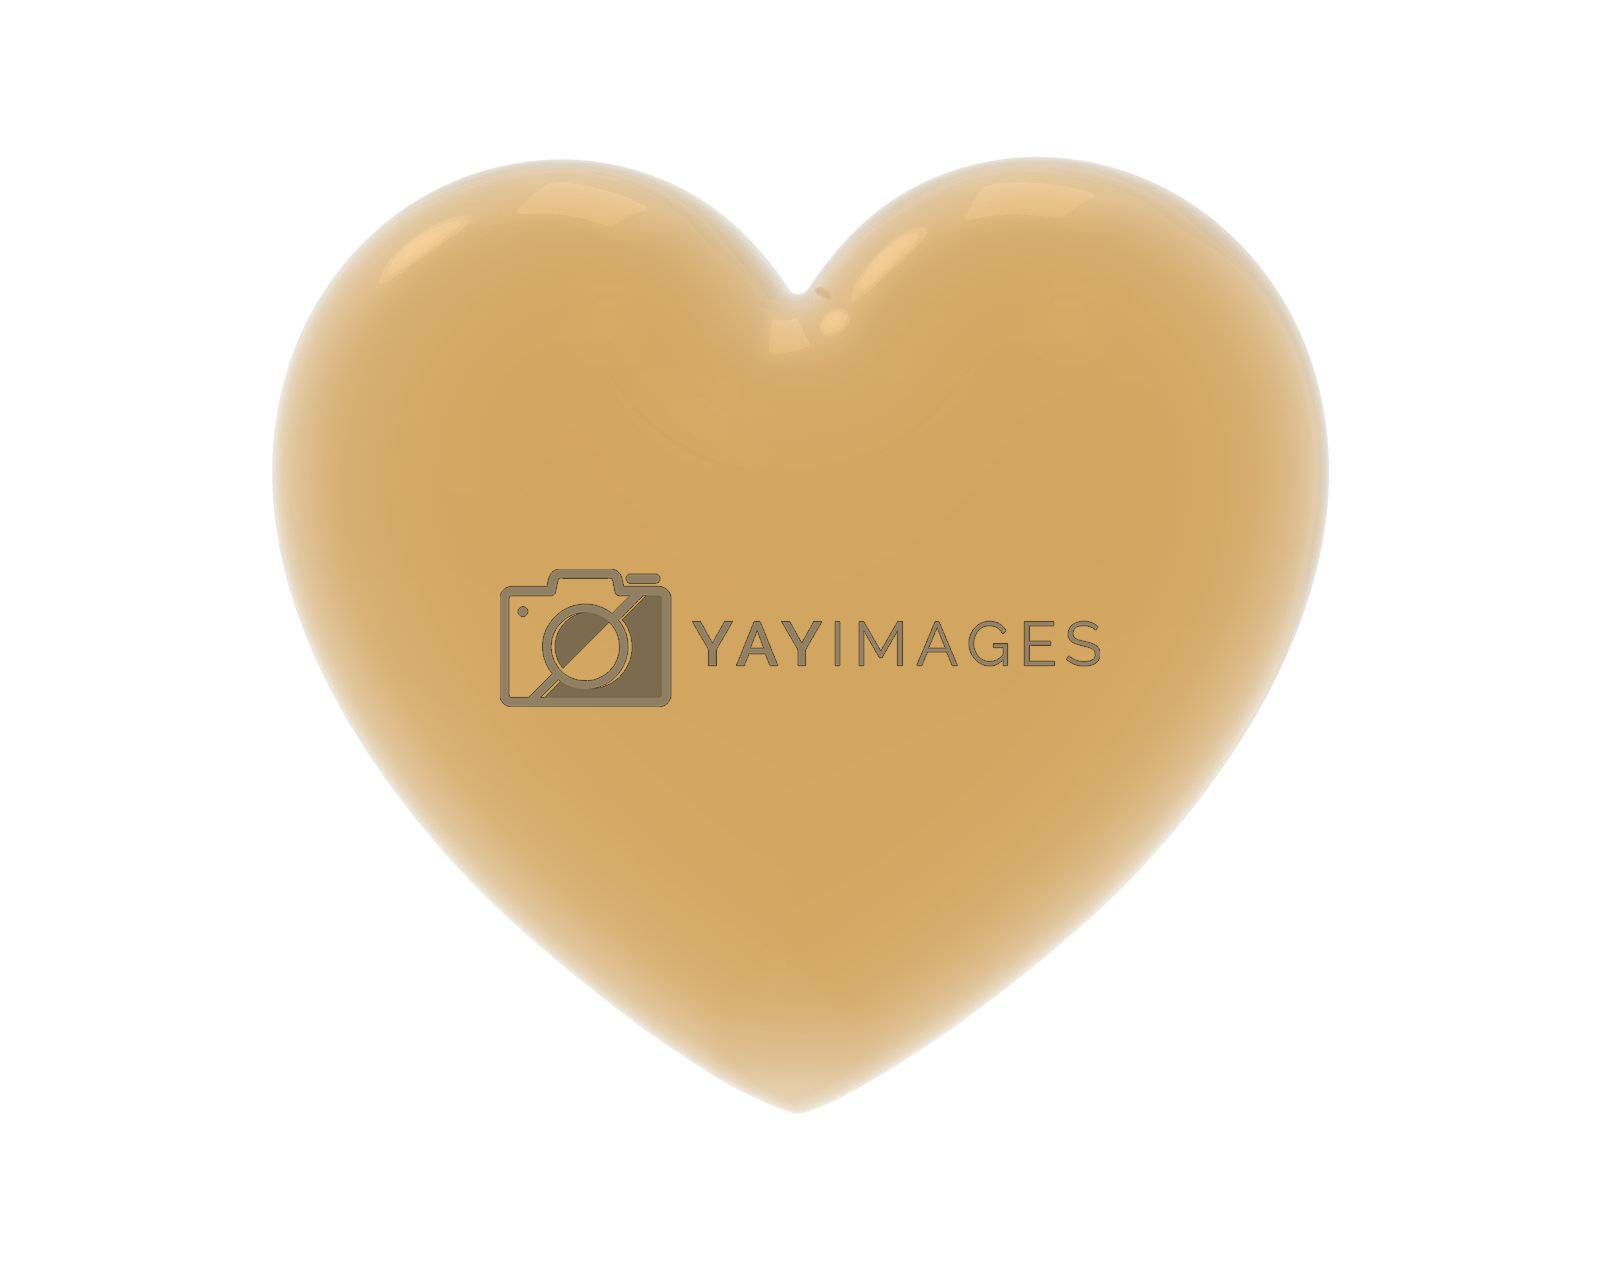 Golden heart isolated on white background, render